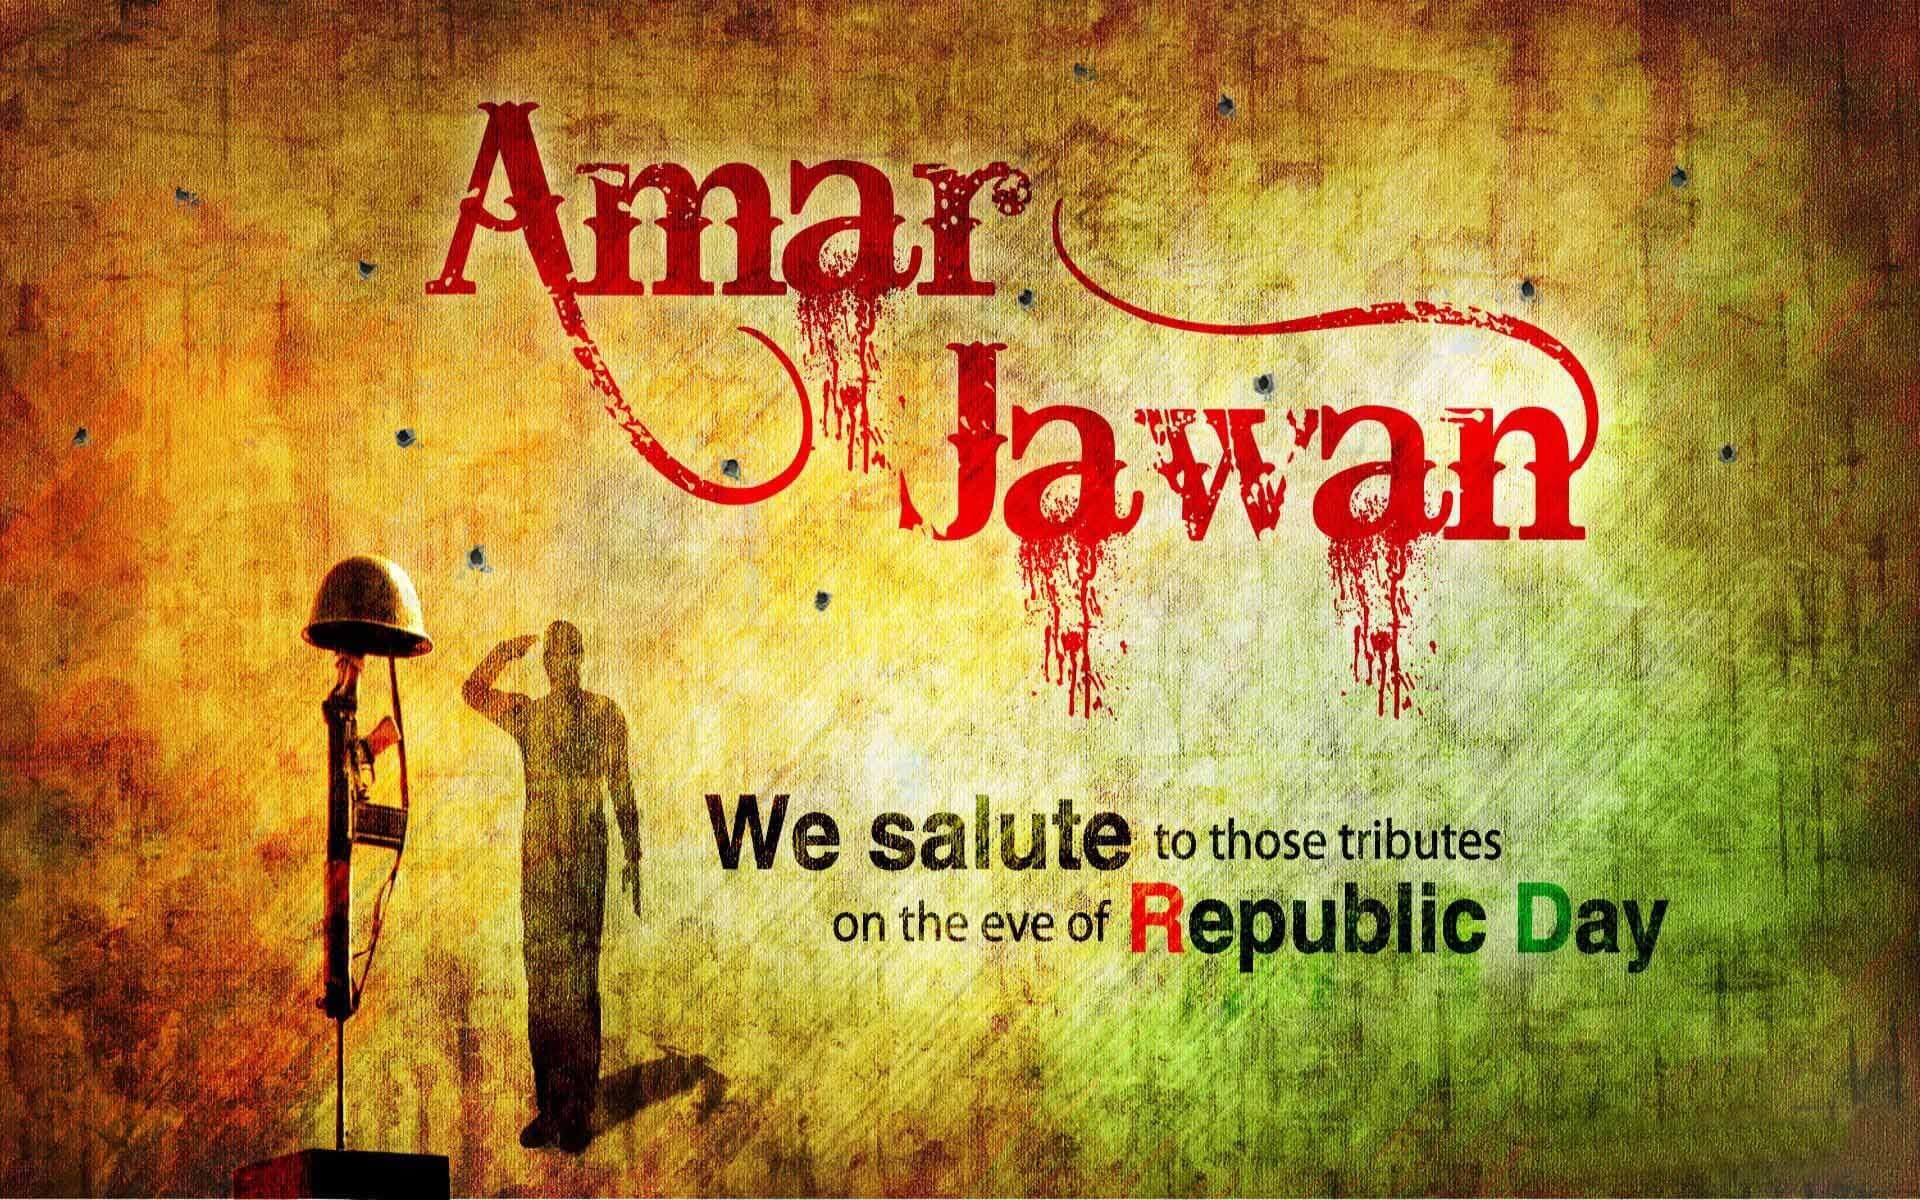 happy republic day wishes india january 26 amar jawan hd desktop wallpaper